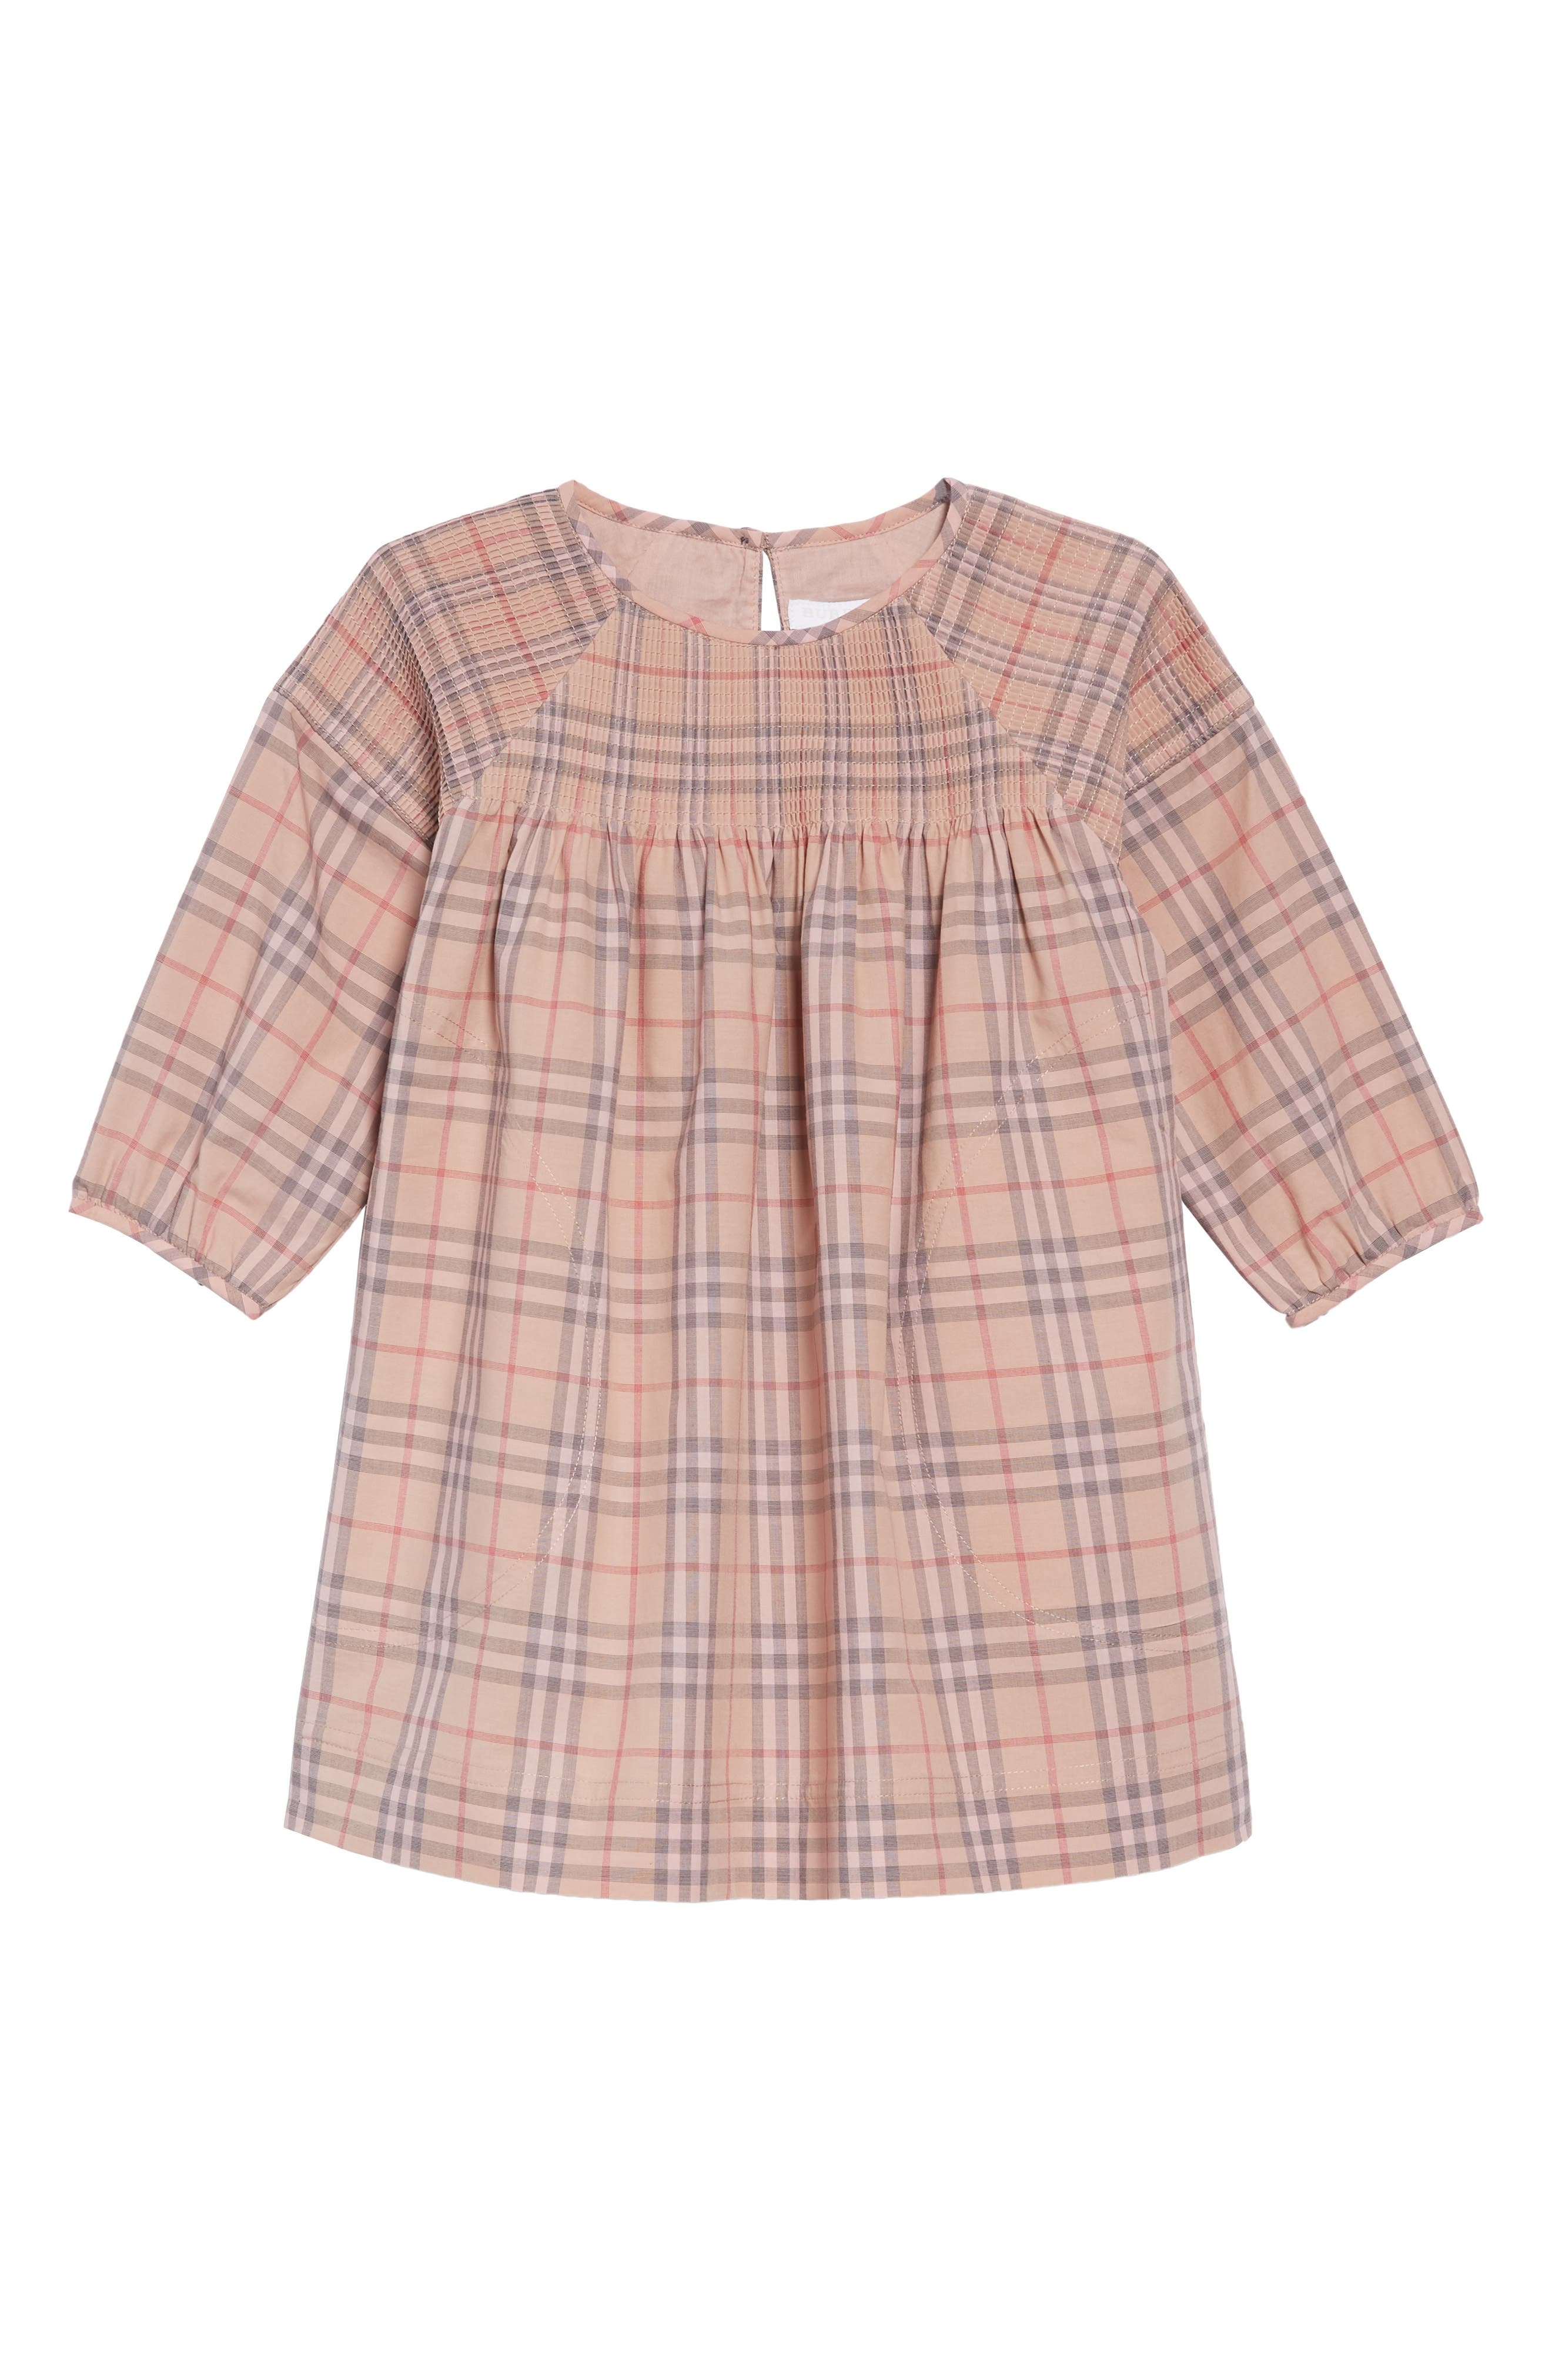 Mini Loralie Ruffle Detail Check Cotton Dress,                             Main thumbnail 1, color,                             PALE PINK